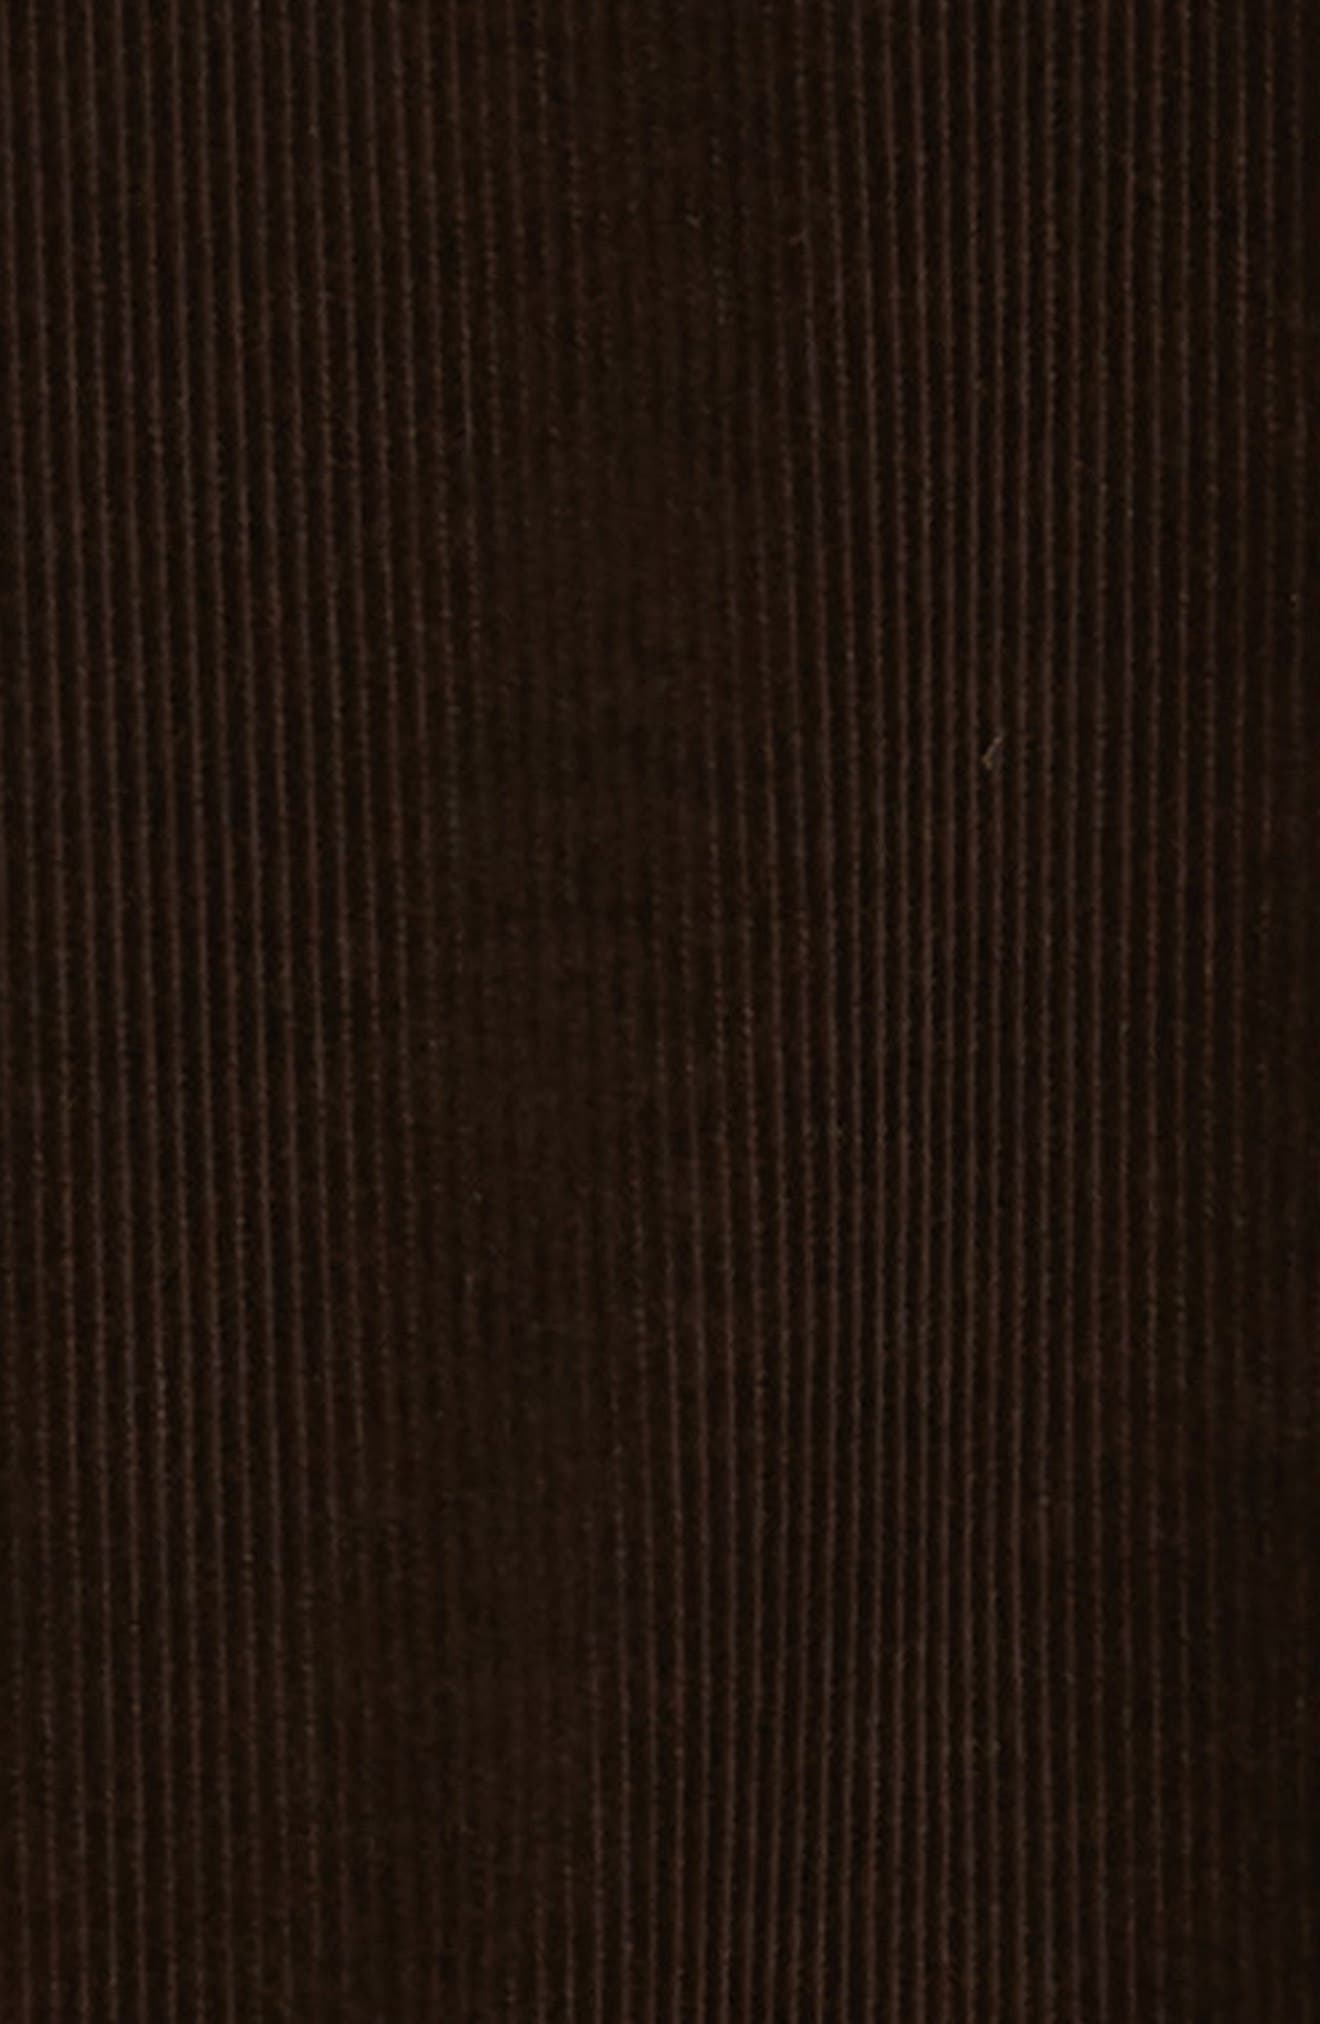 Madison Corduroy Shirt,                             Alternate thumbnail 6, color,                             TOBACCO / WAX